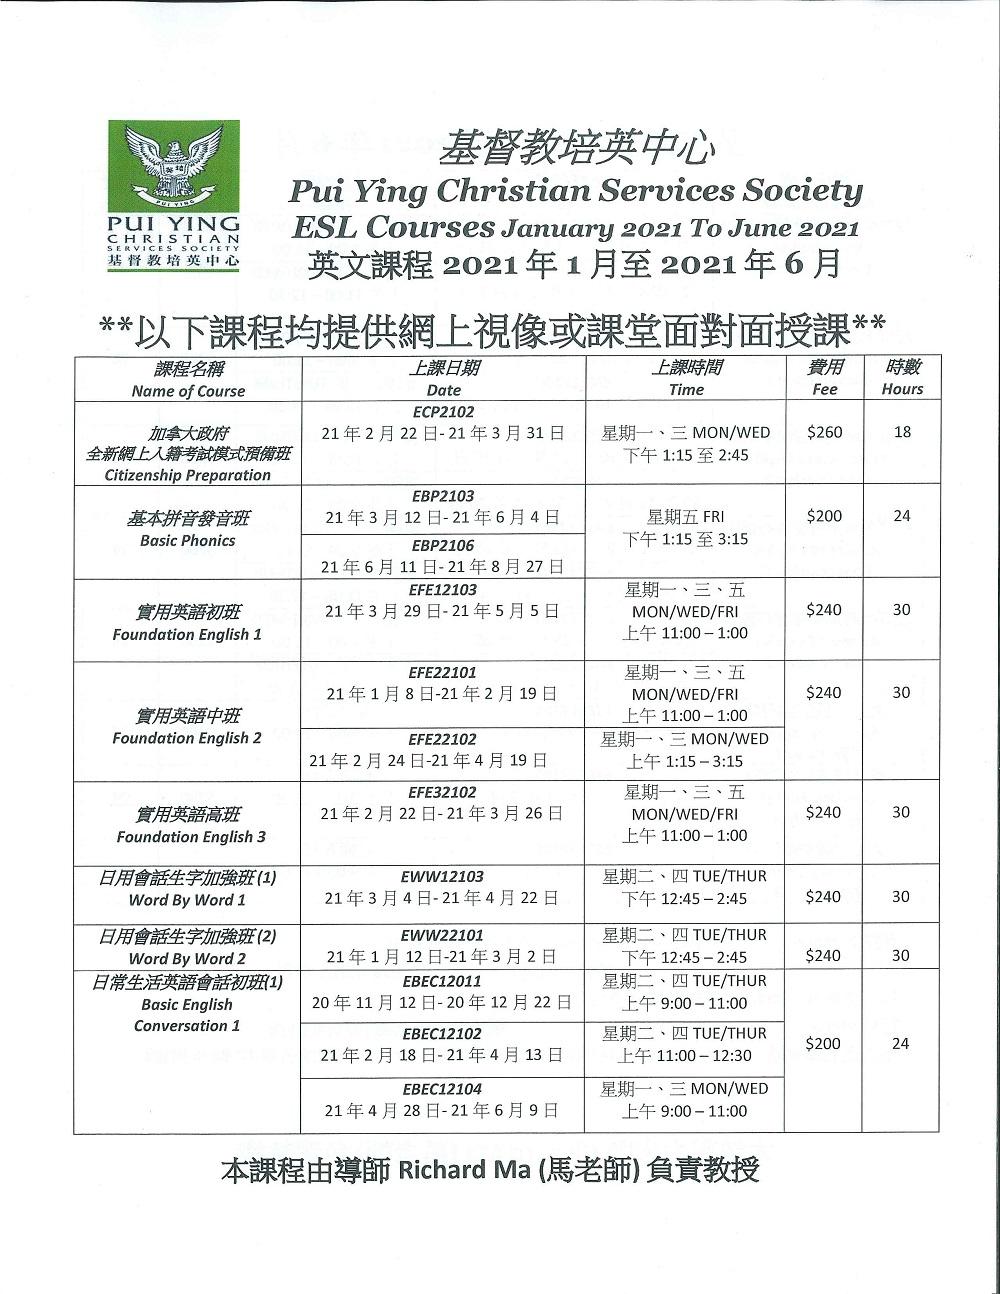 Adult English Class (September – March 2021) 成 人 英 語 課 程 (2020 年 9 月 至 2021 年 3 月)